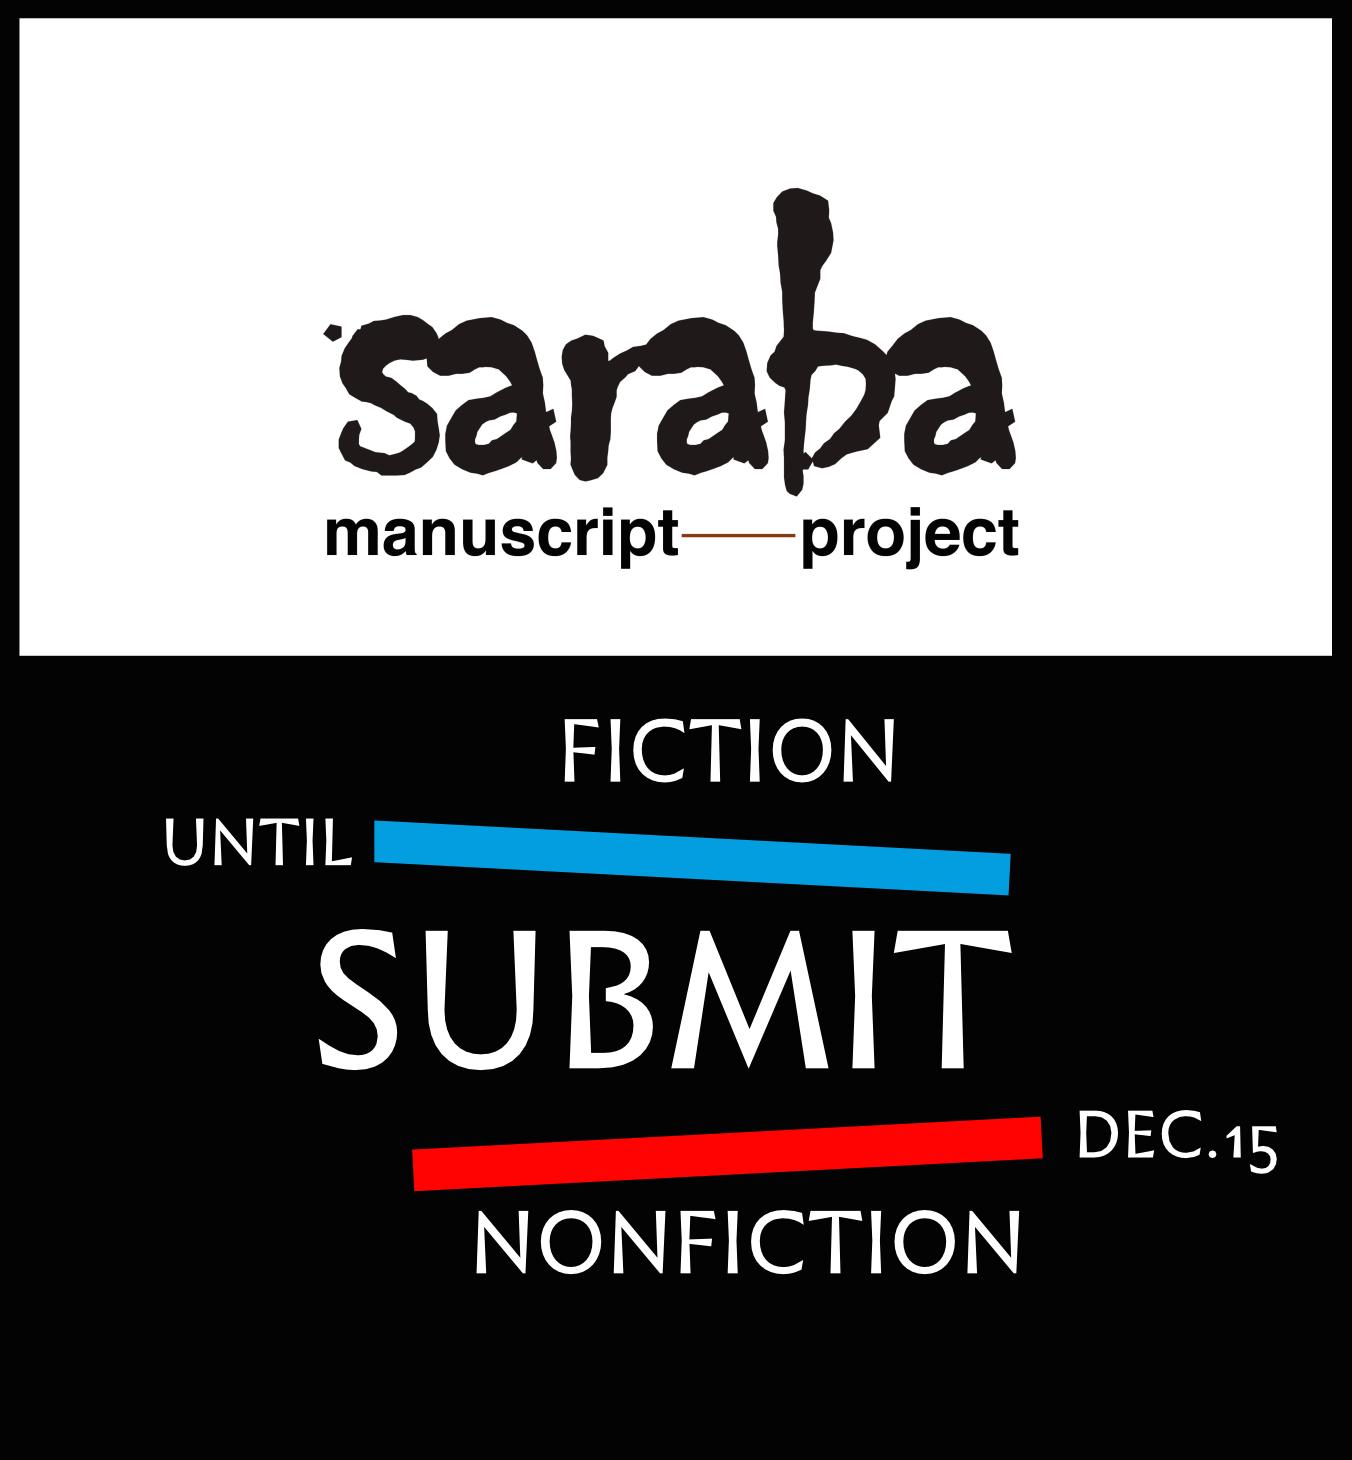 http://www.sarabamag.com/wp-content/uploads/2015/08/Saraba-MS-Web-4.png